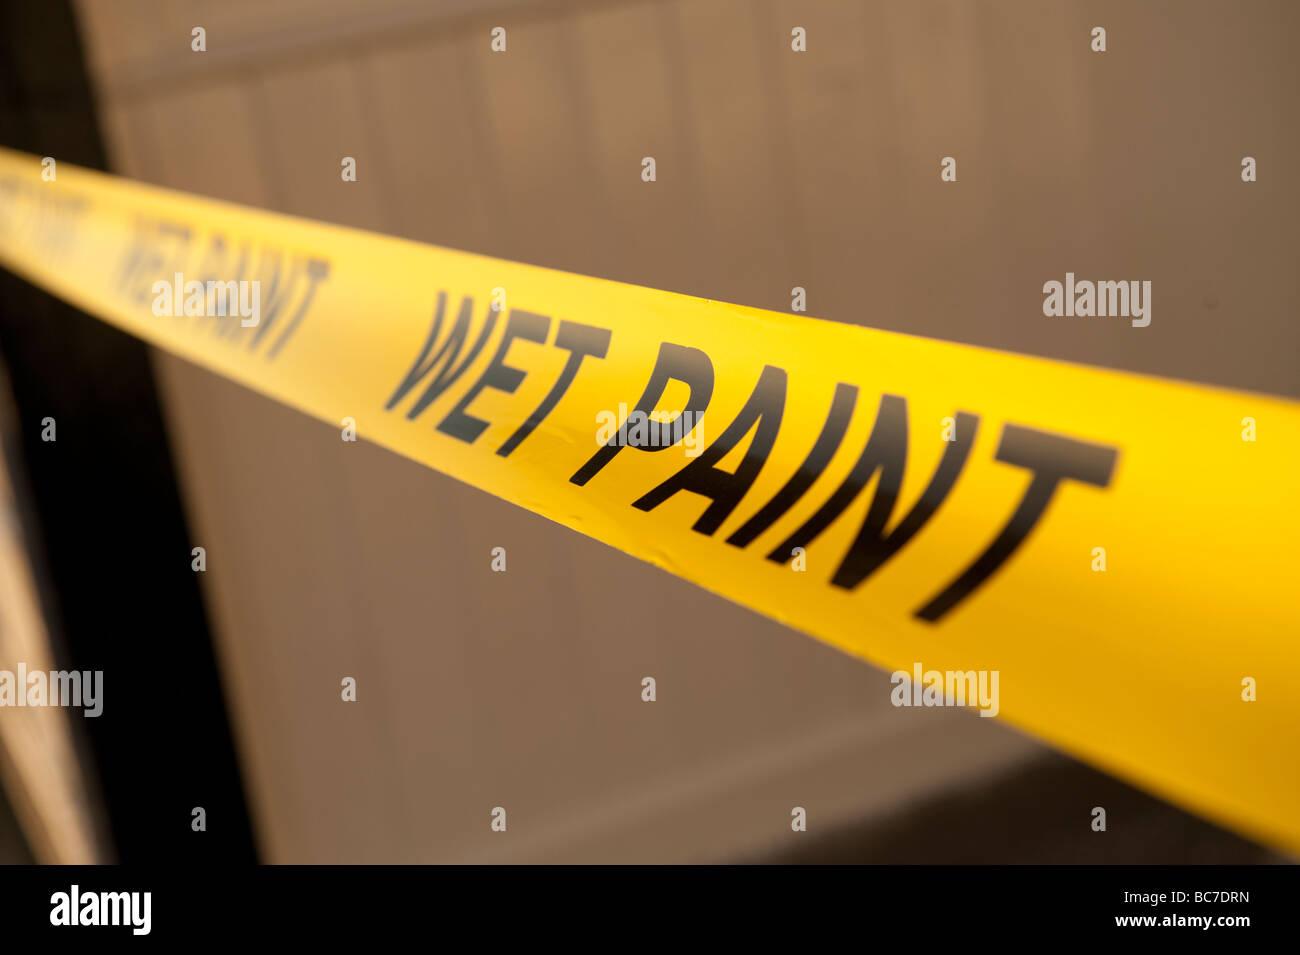 Ruban d'avertissement jaune peinture humide Photo Stock